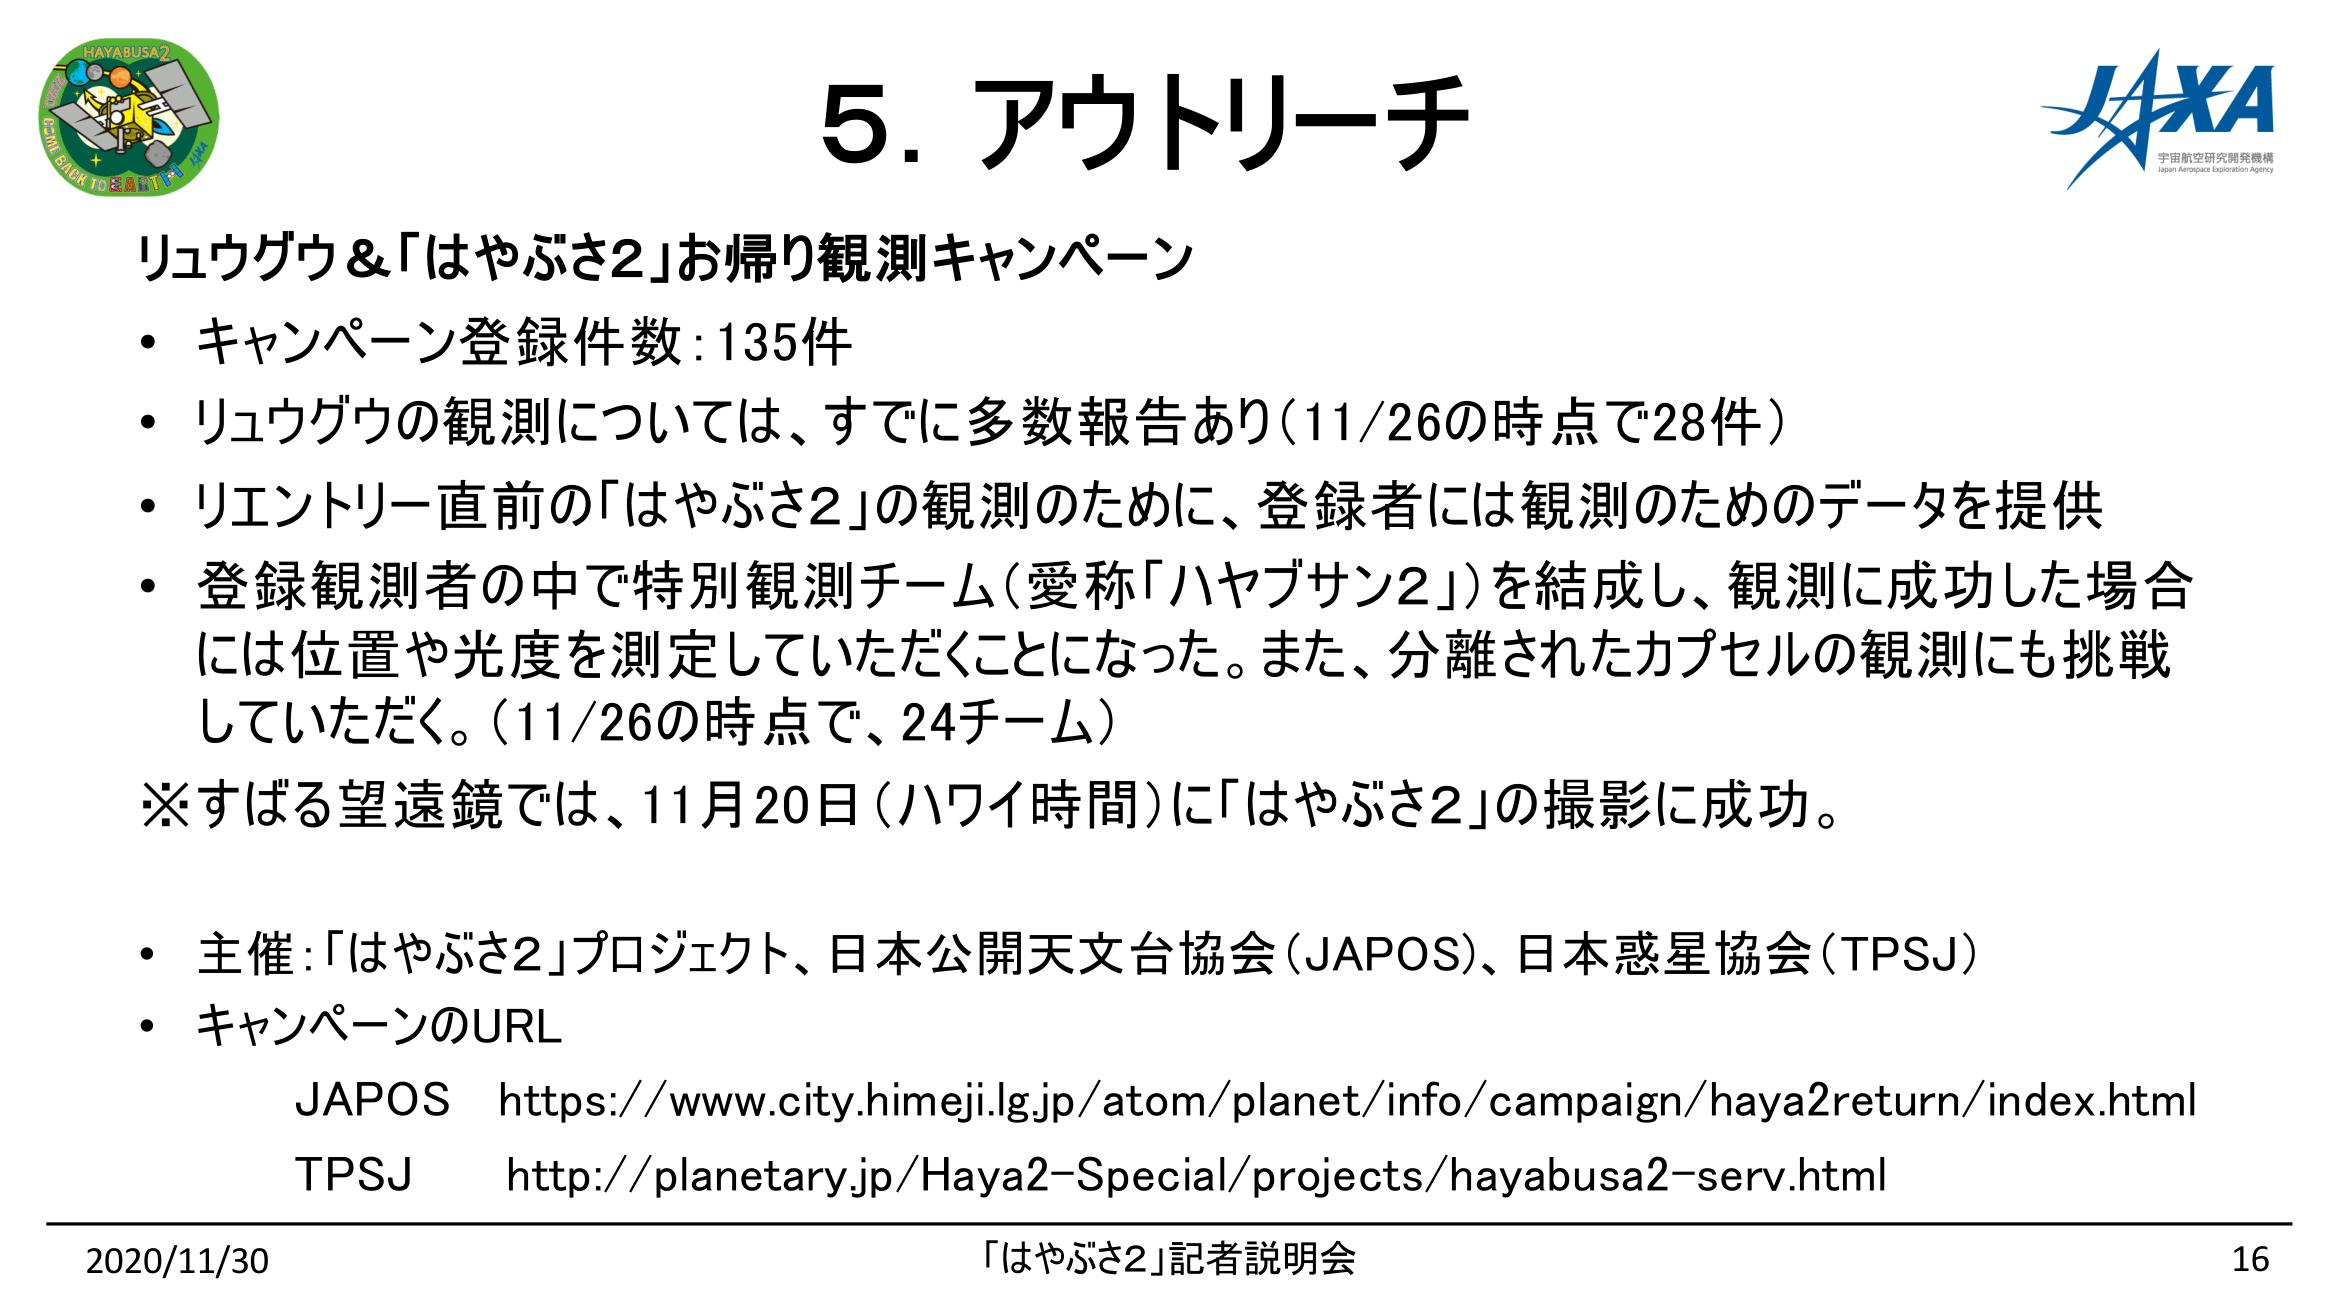 f:id:Imamura:20201130154209p:plain